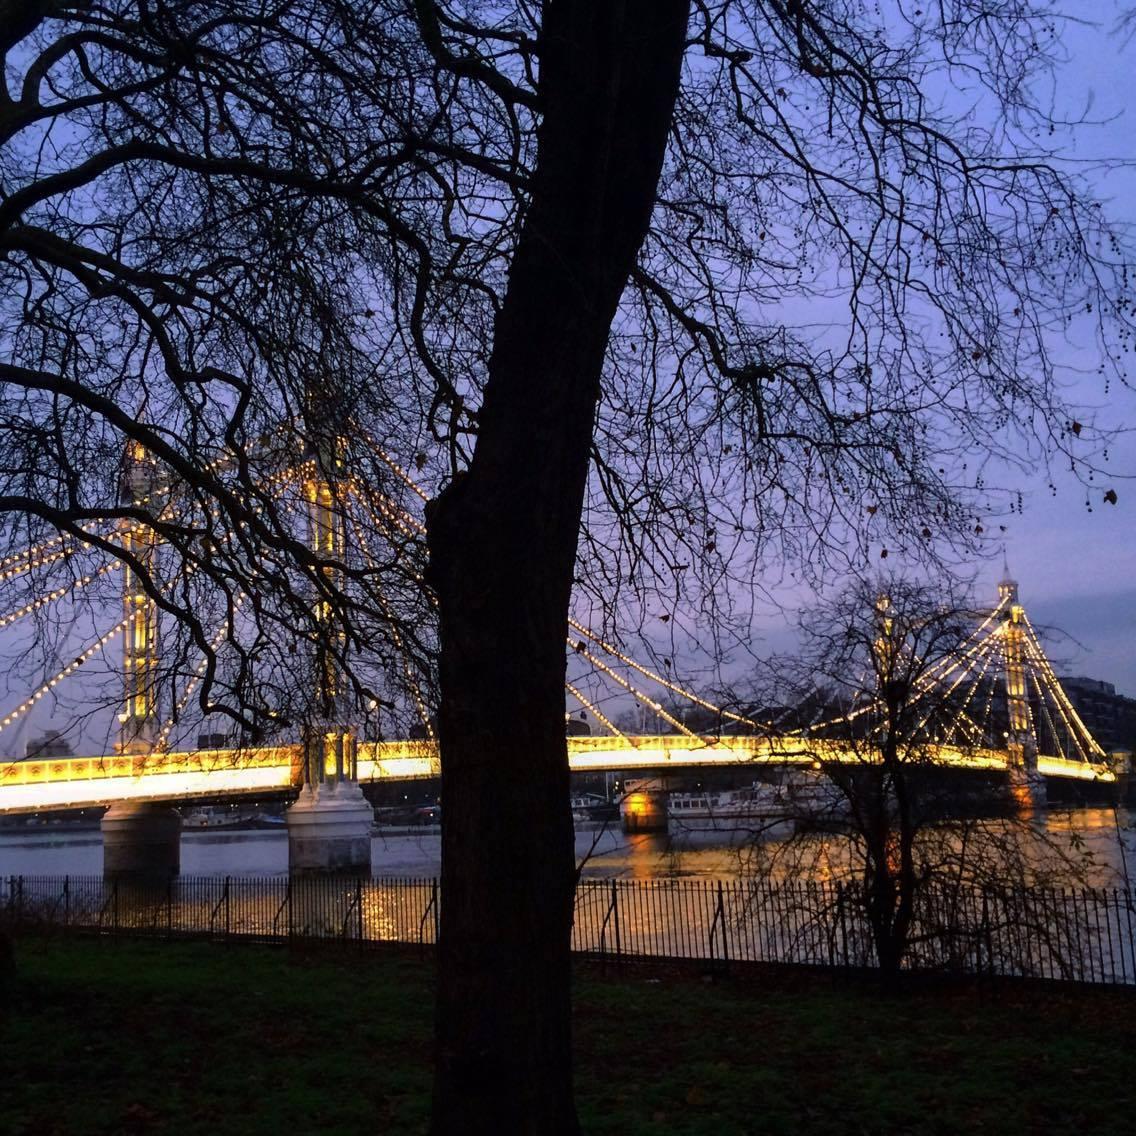 Things to do in Battersea Park Albert Bridge